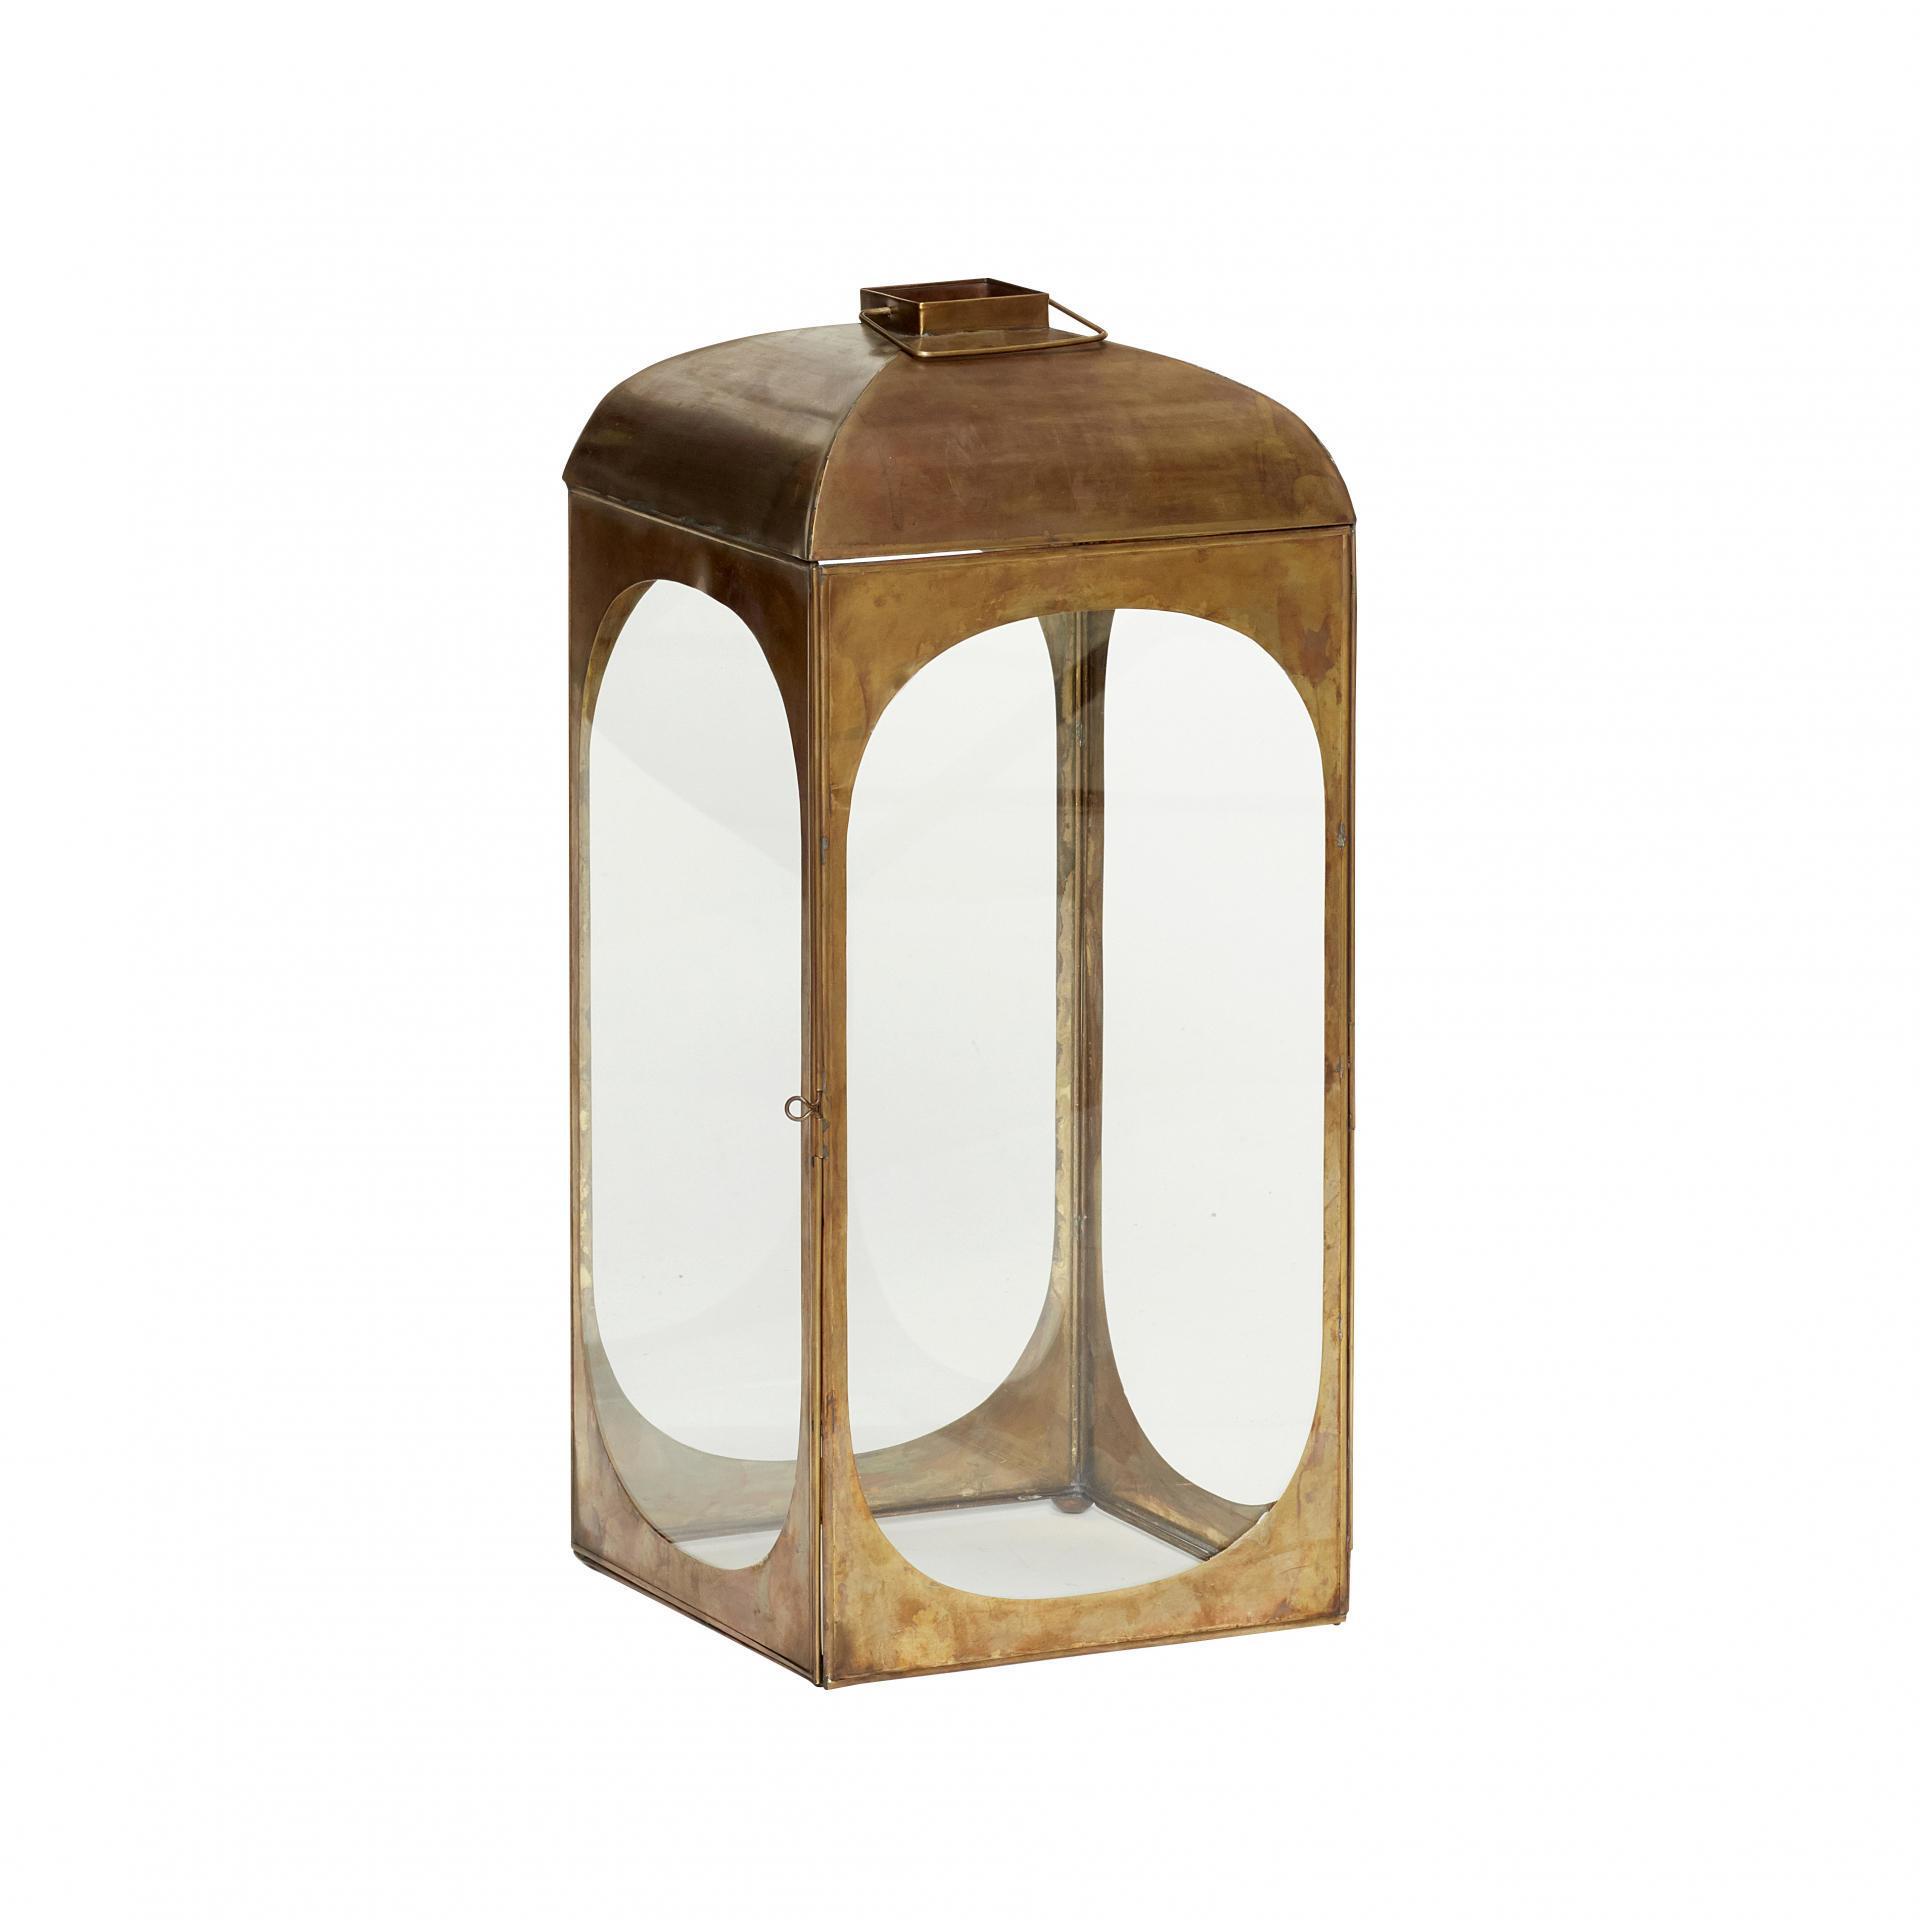 Hübsch Kovová lucerna Brass, měděná barva, kov